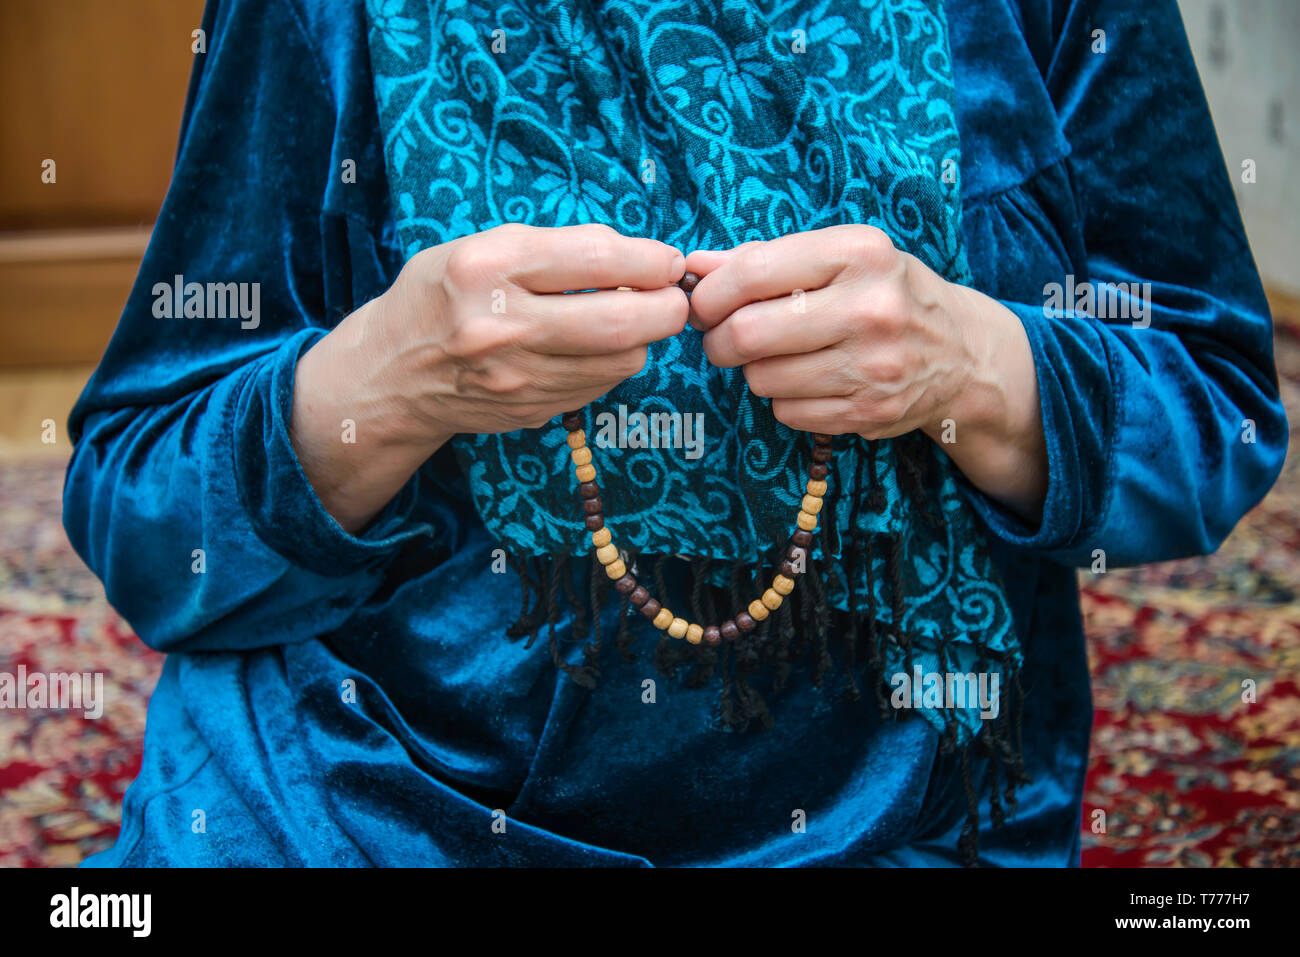 Muslim Namaz Hand Stock Photos & Muslim Namaz Hand Stock Images - Alamy